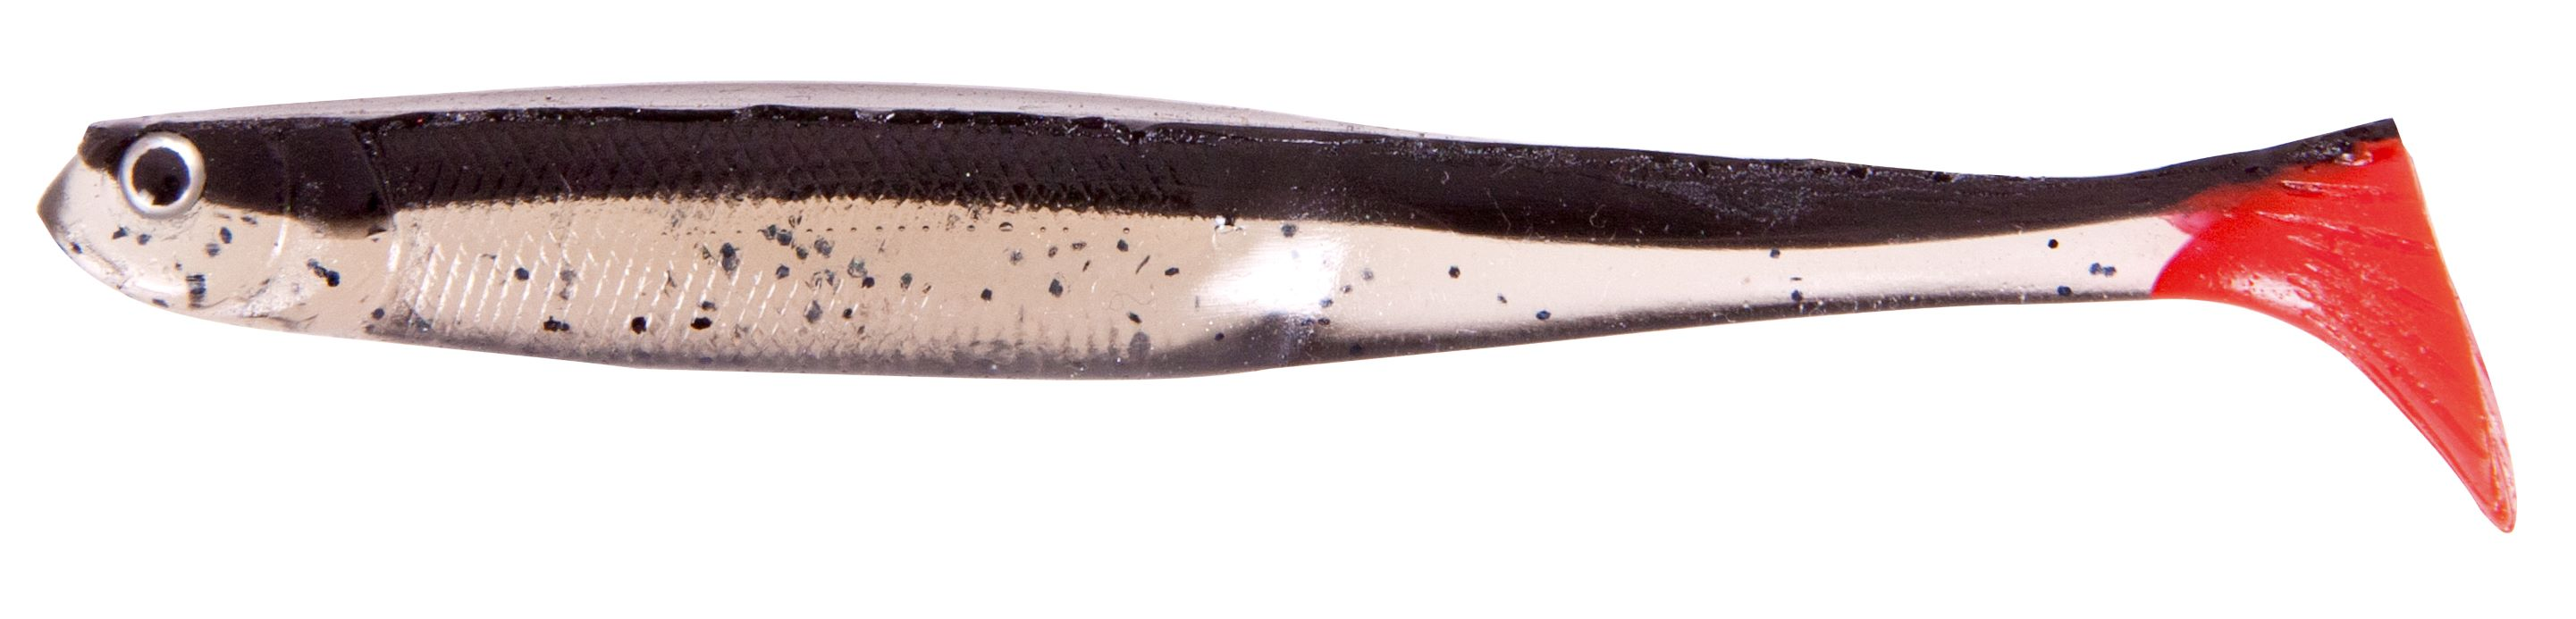 Iron Claw gumová nástraha Slim Jim 10 cm Vzor CB, 3ks